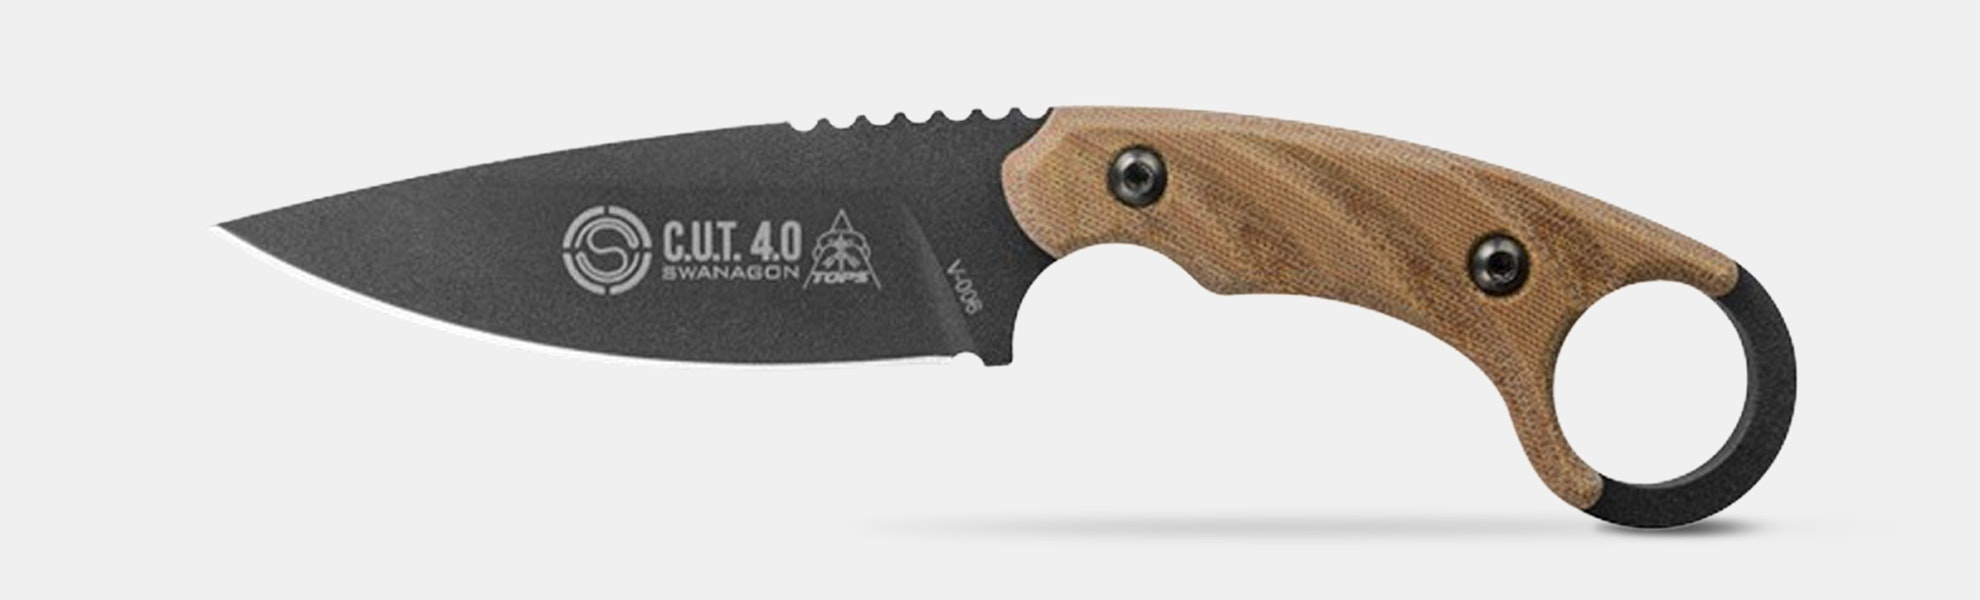 TOPS Knives C.U.T. 4.0 Combat Utility Tool Knife